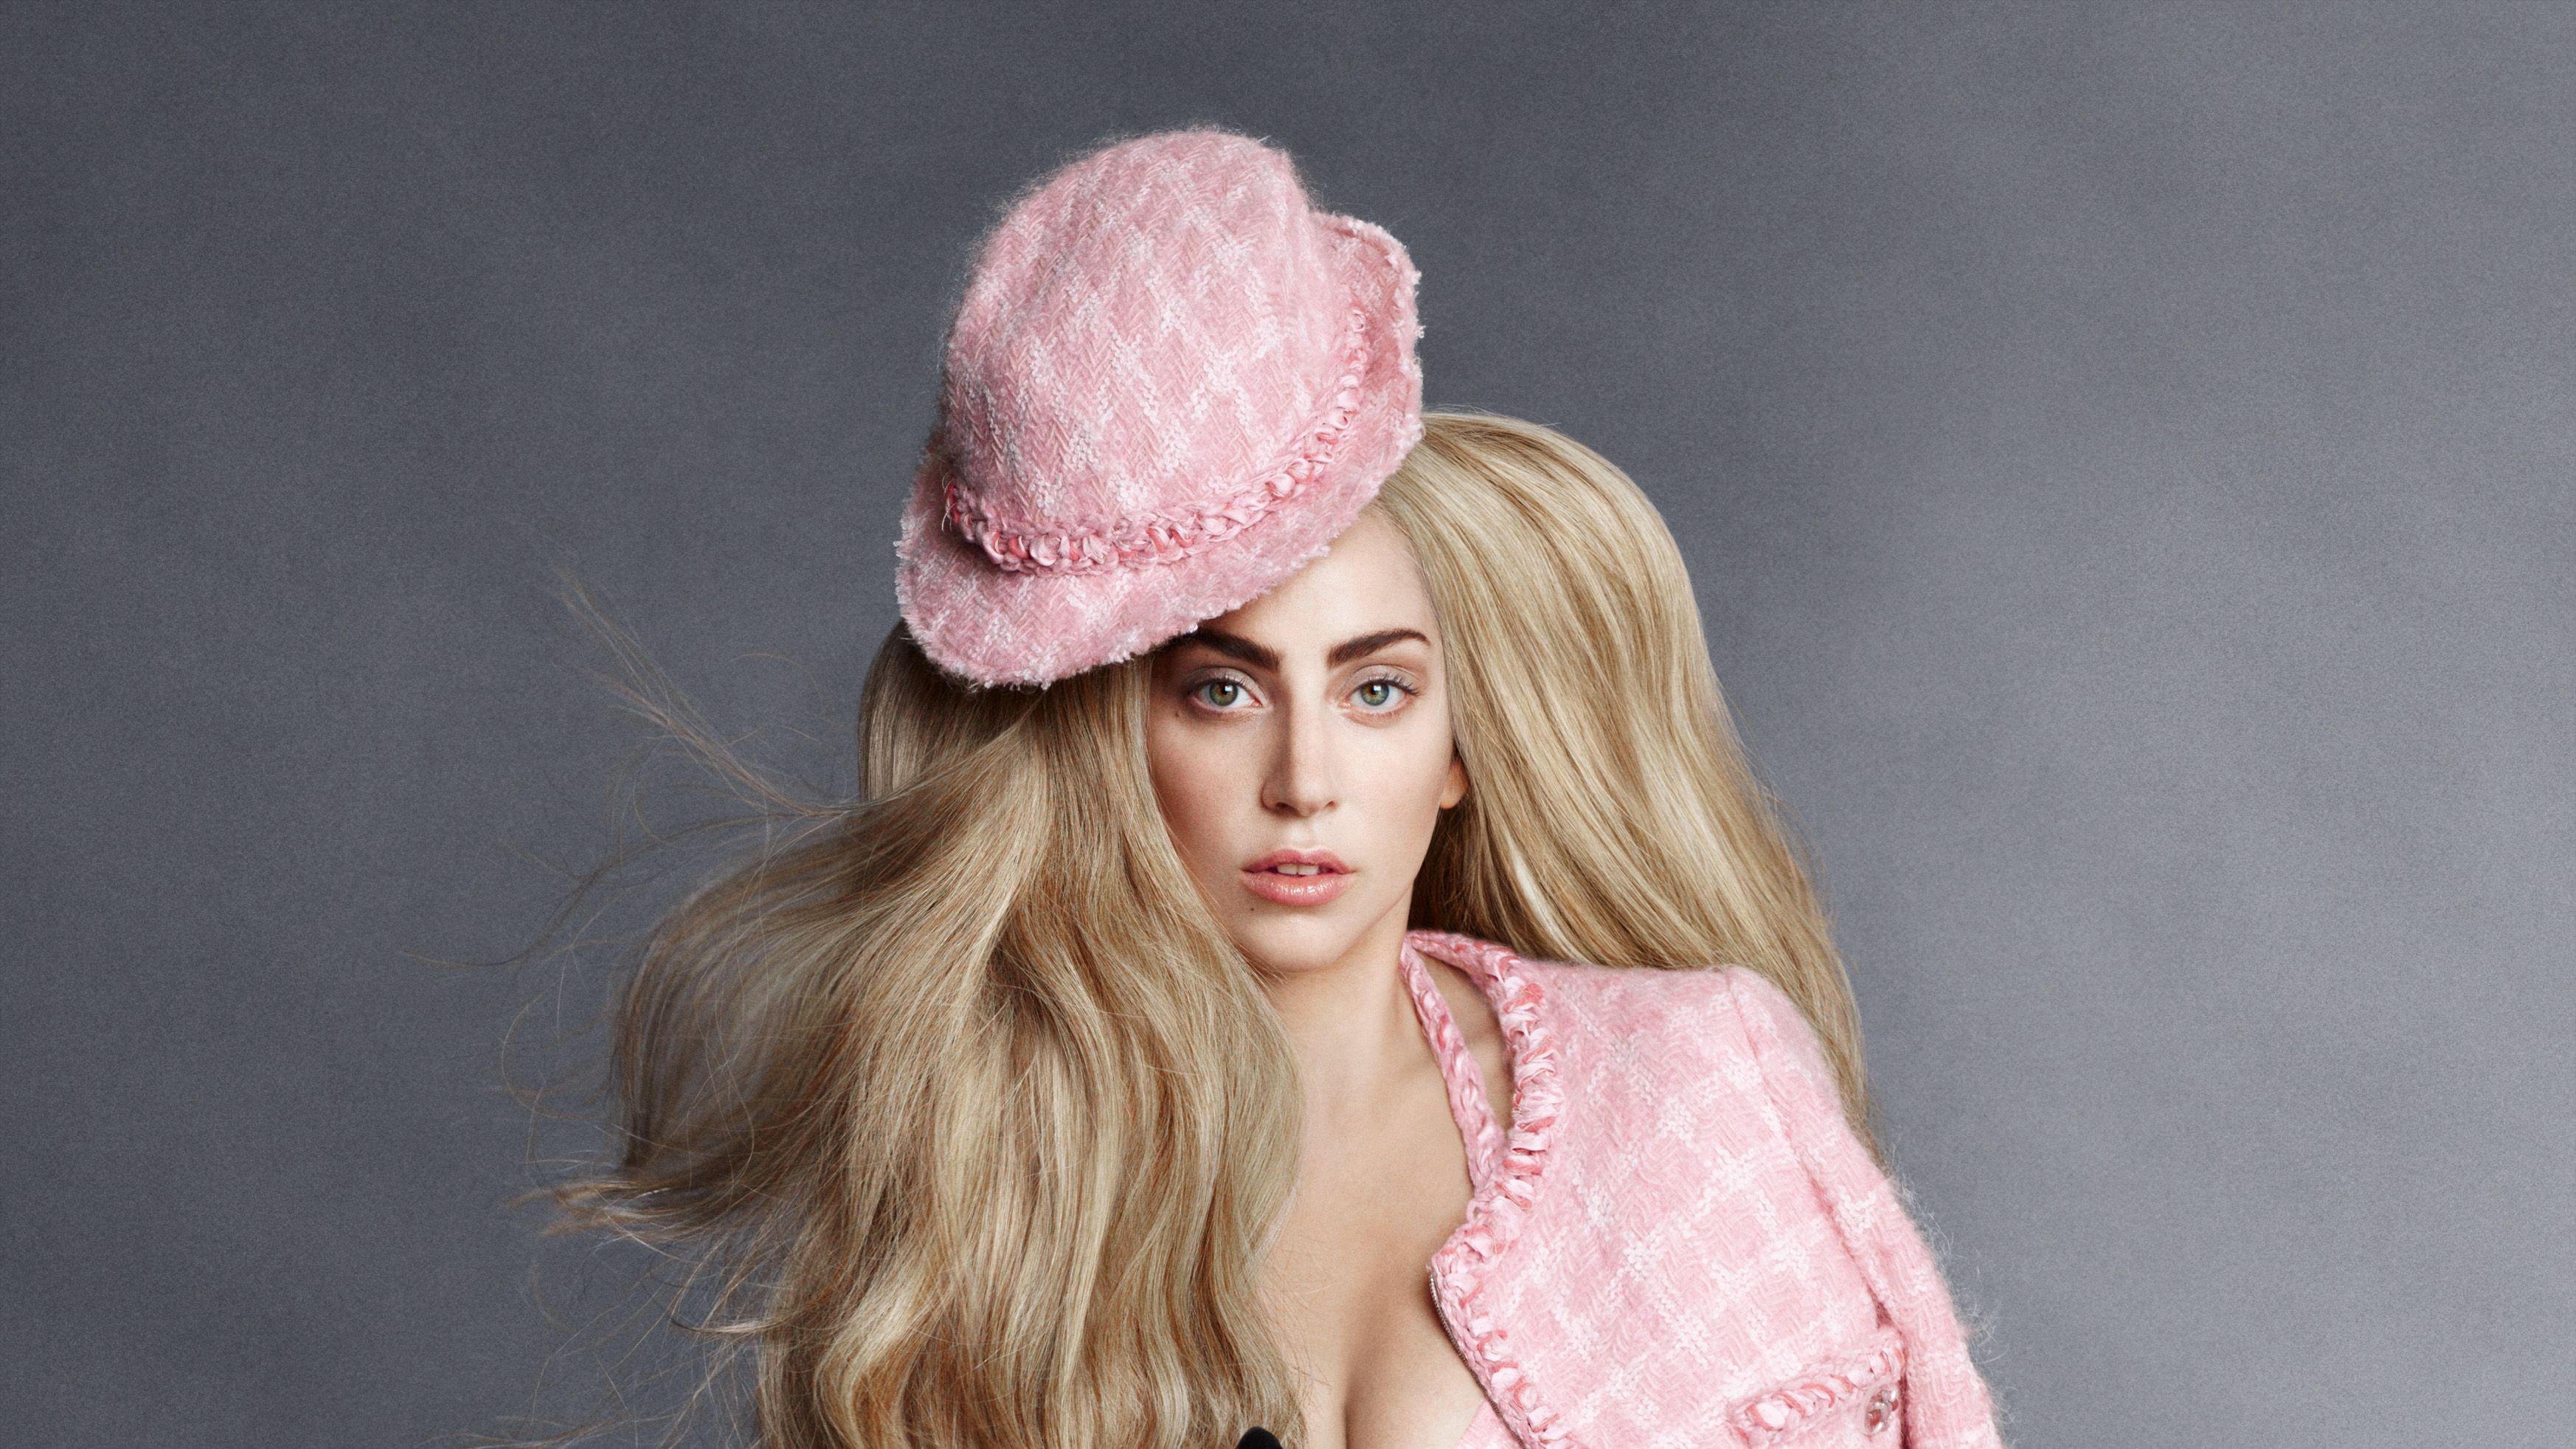 American Blonde Hat Hazel Eyes Lady Gaga Singer 3492x1964